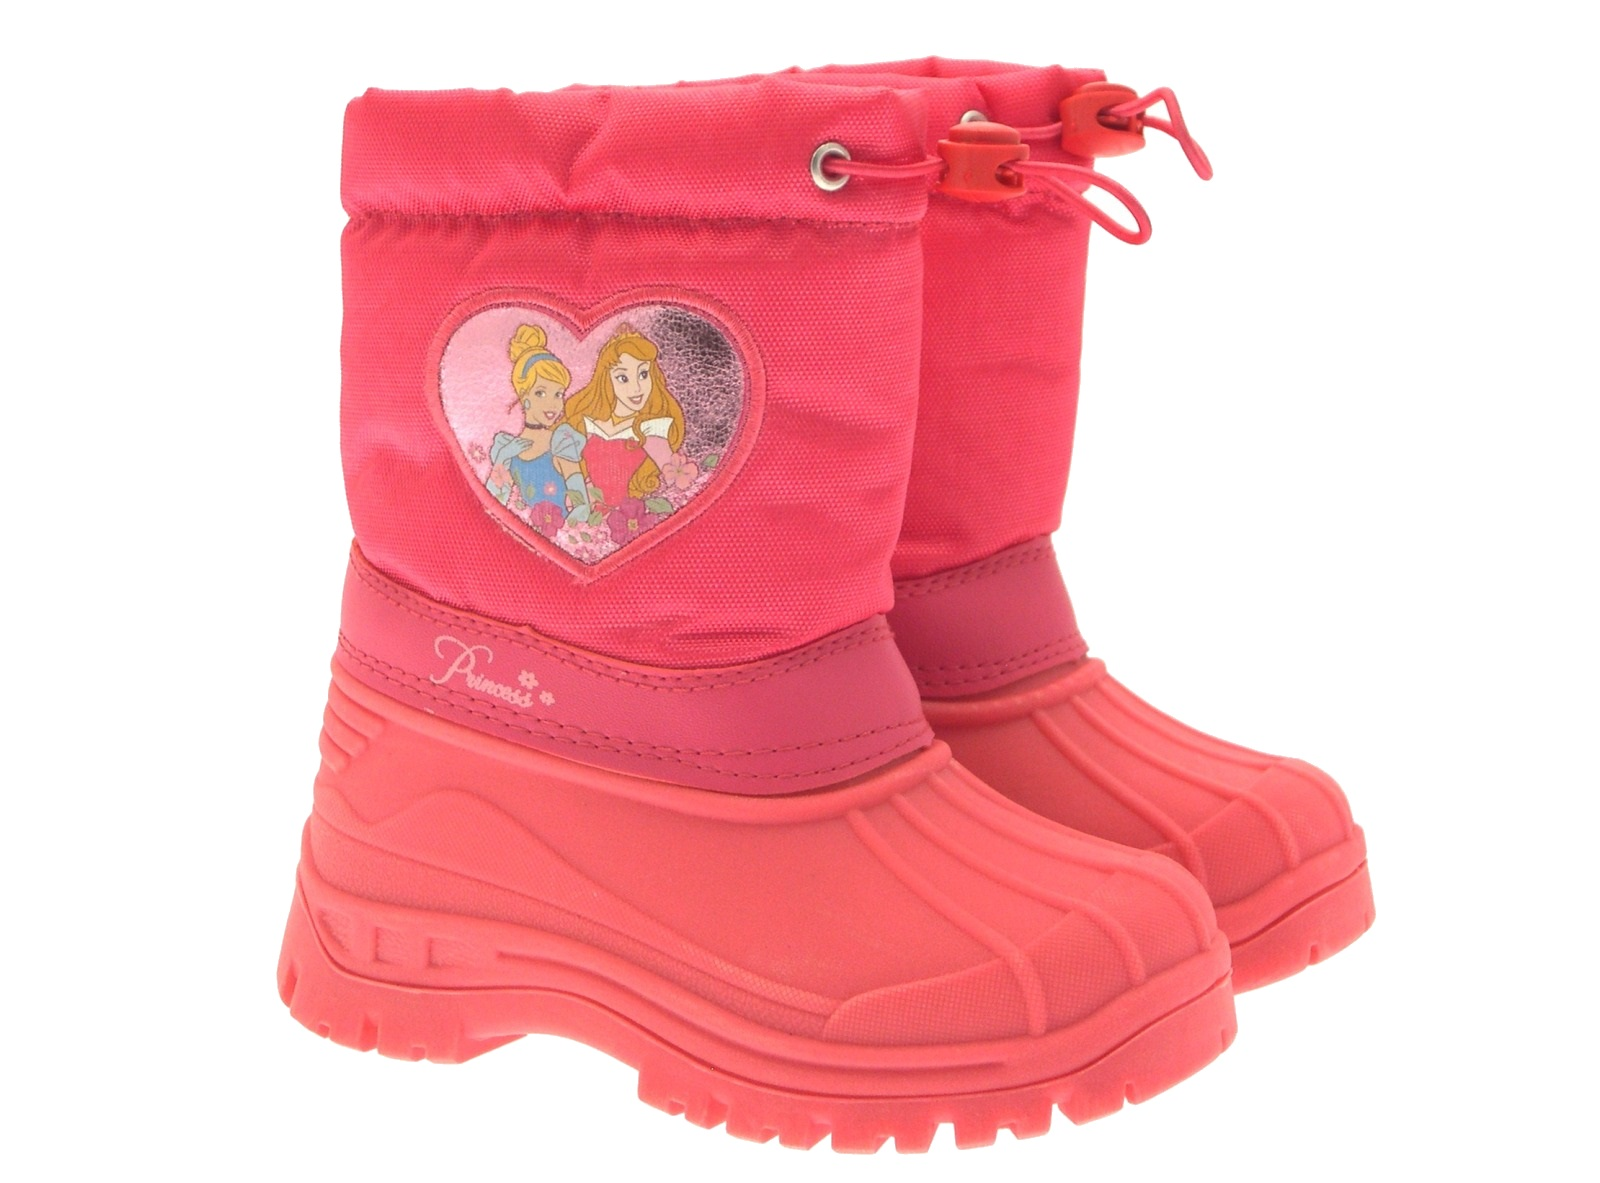 Disney Princess Snow Boots Light Up Kids Girls Disney